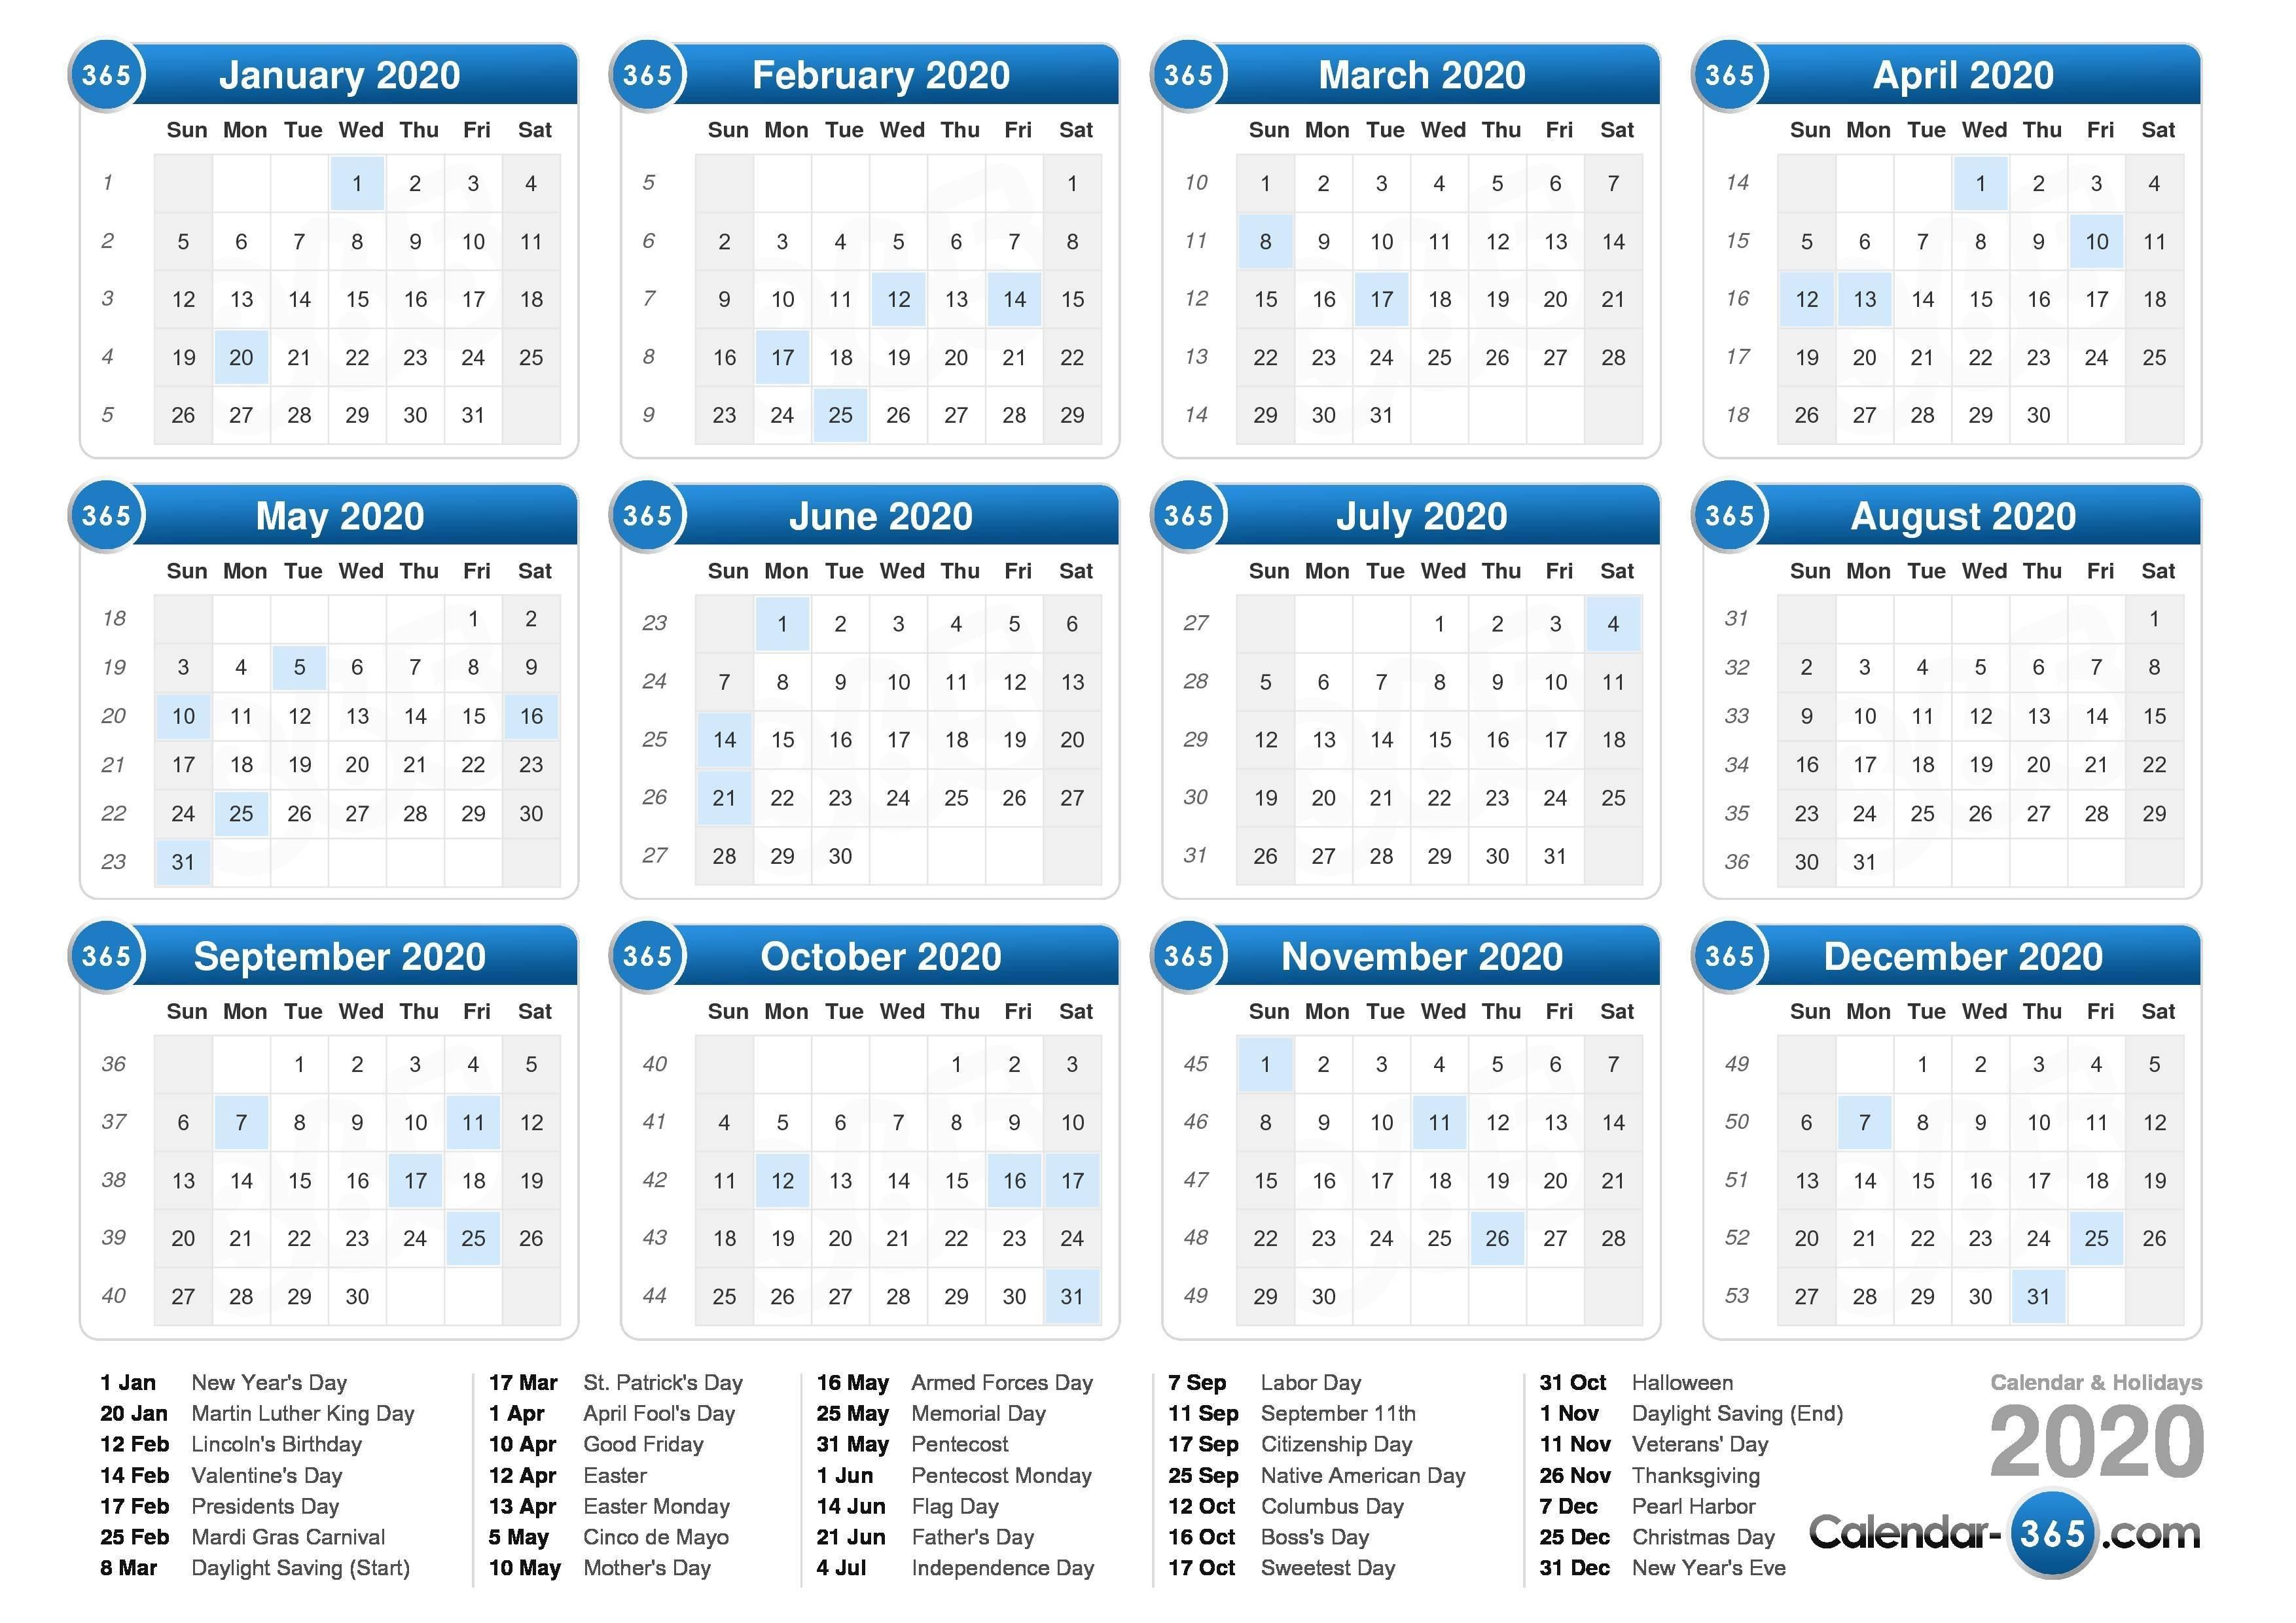 2020 Calendar-2020 Calendar South Africa With Public Holidays